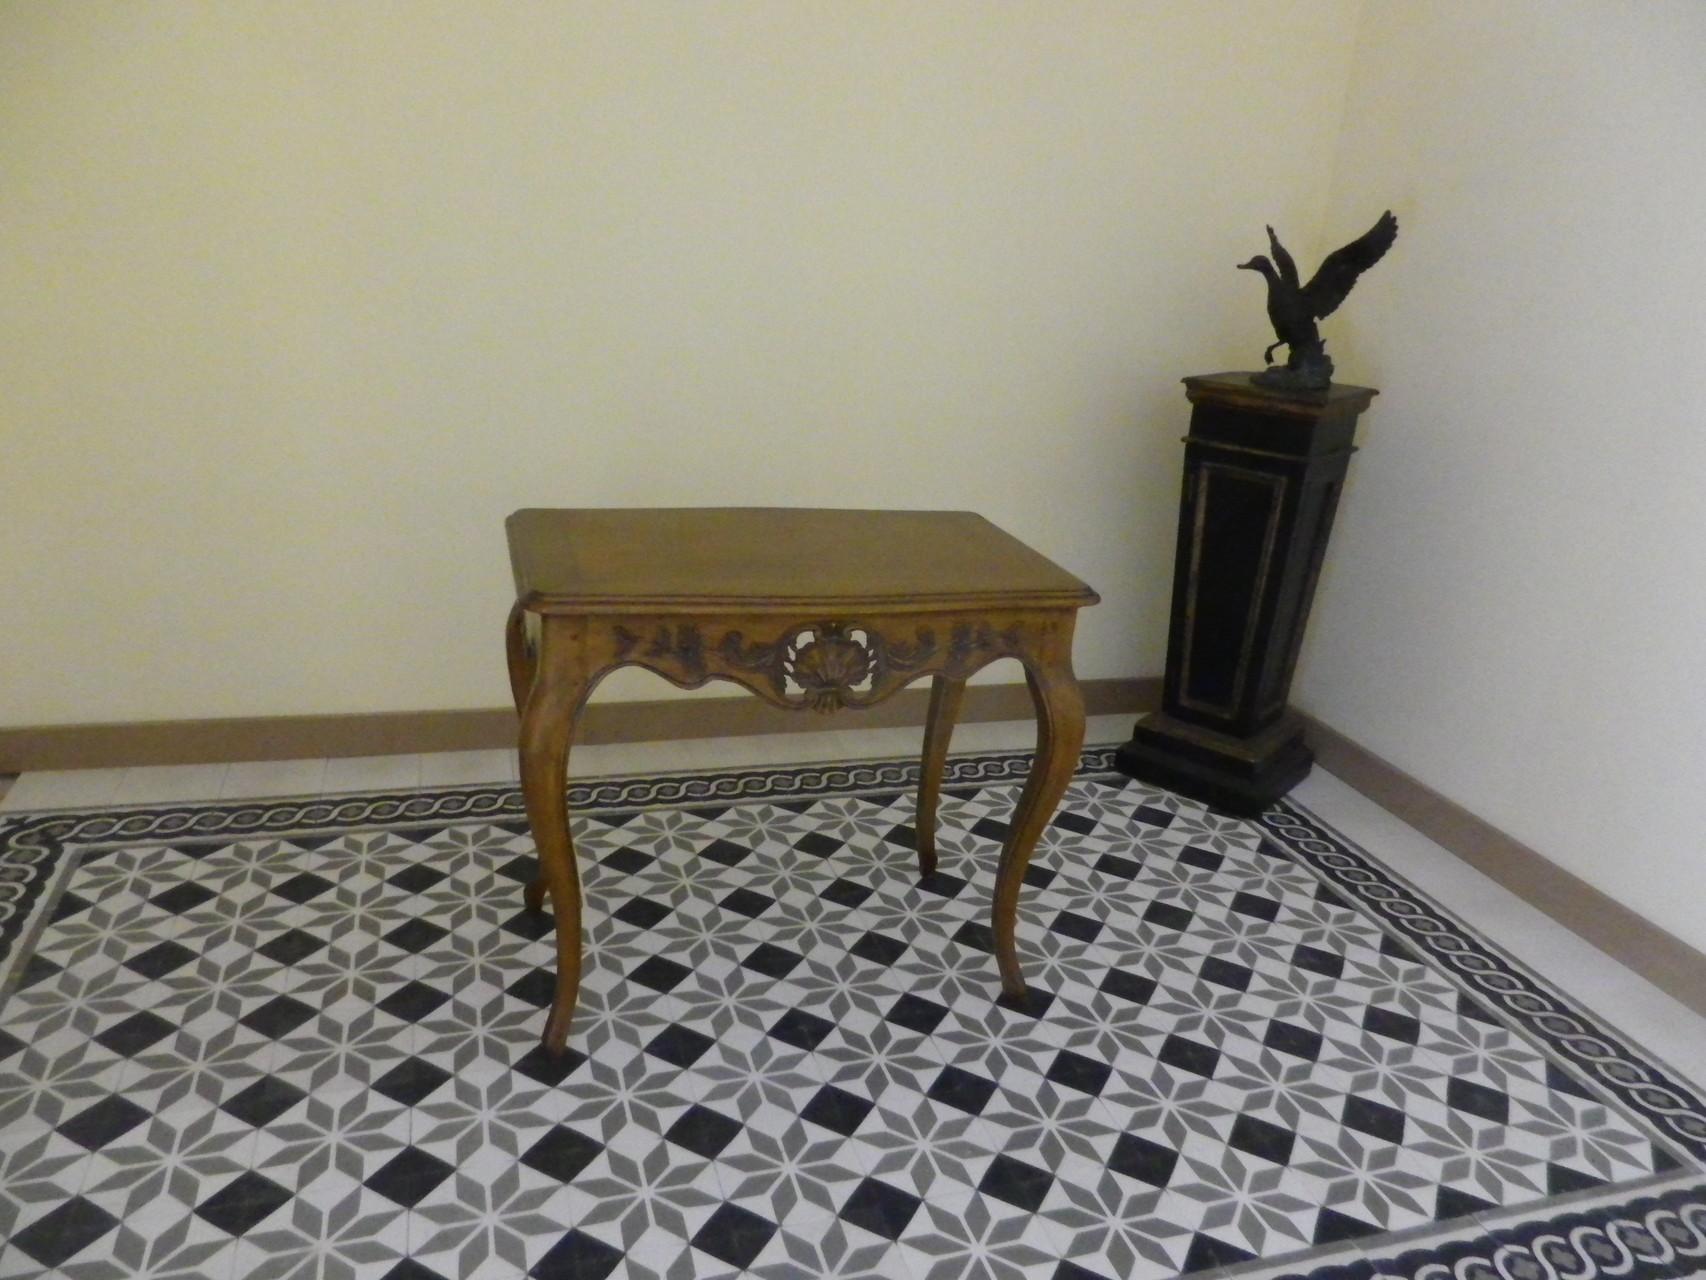 carreau ciment salon - motif éole